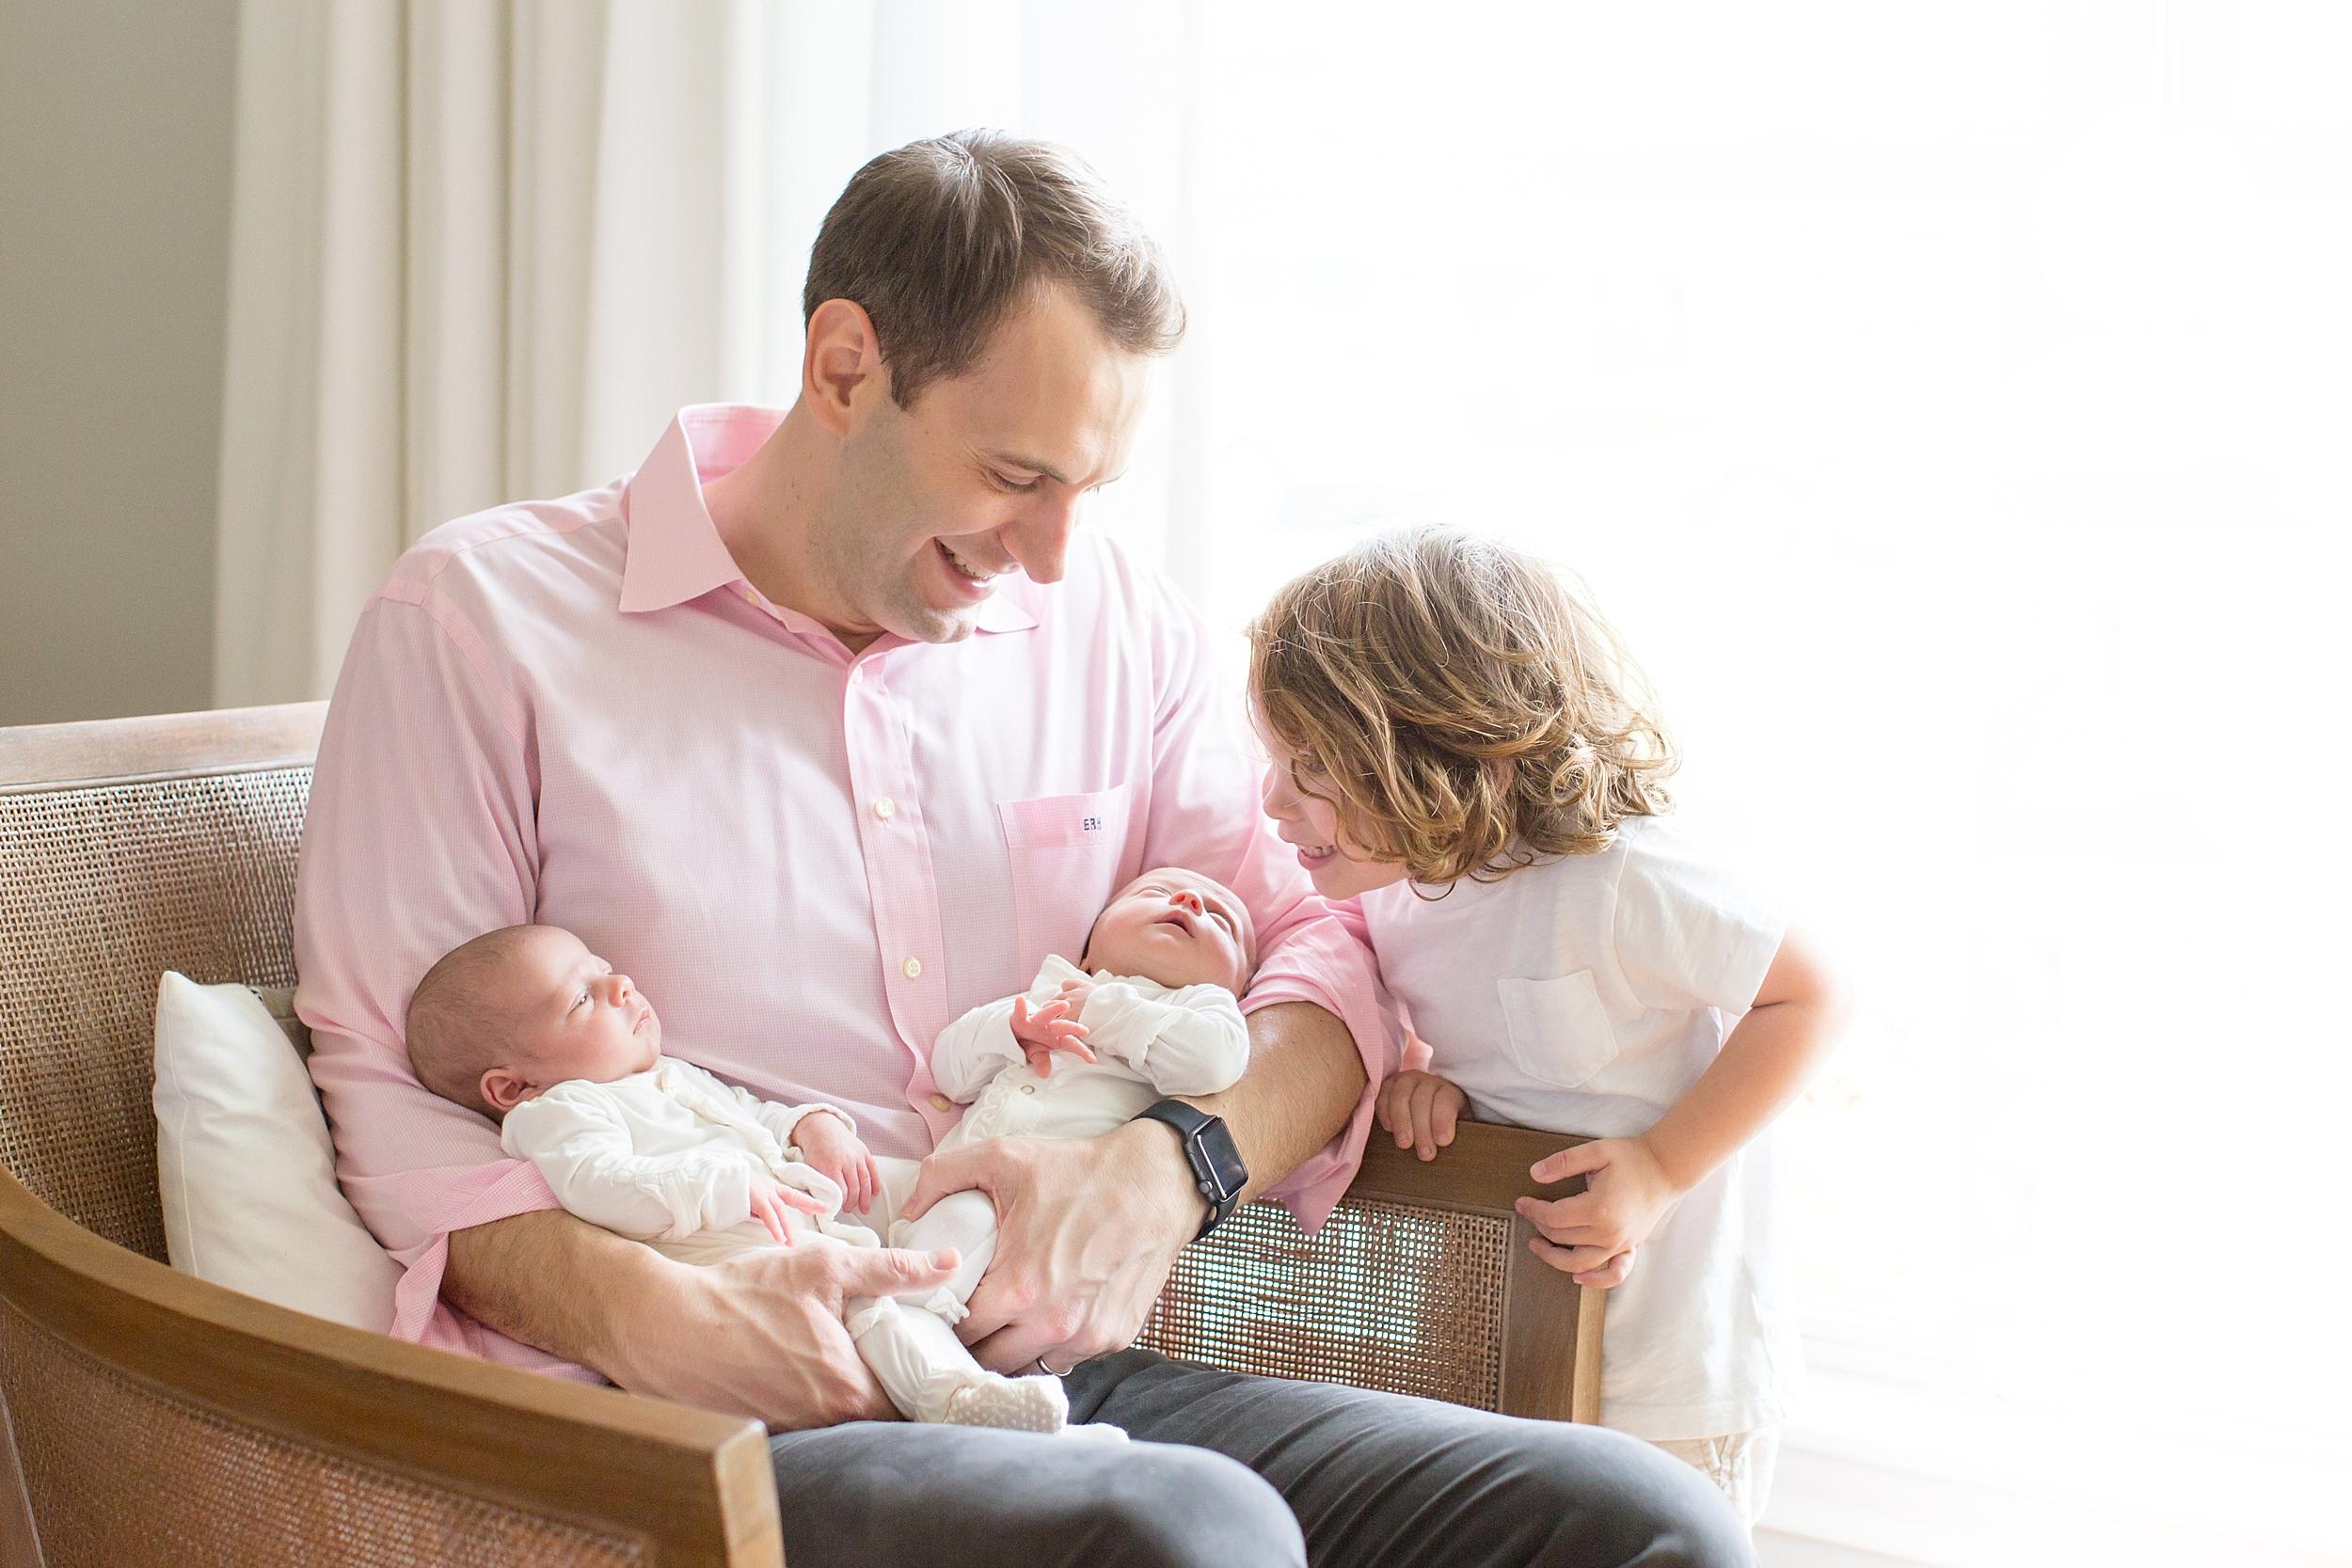 Landon-Schneider-Photography-Holt-Newborn-Session-Texas_0005.jpg